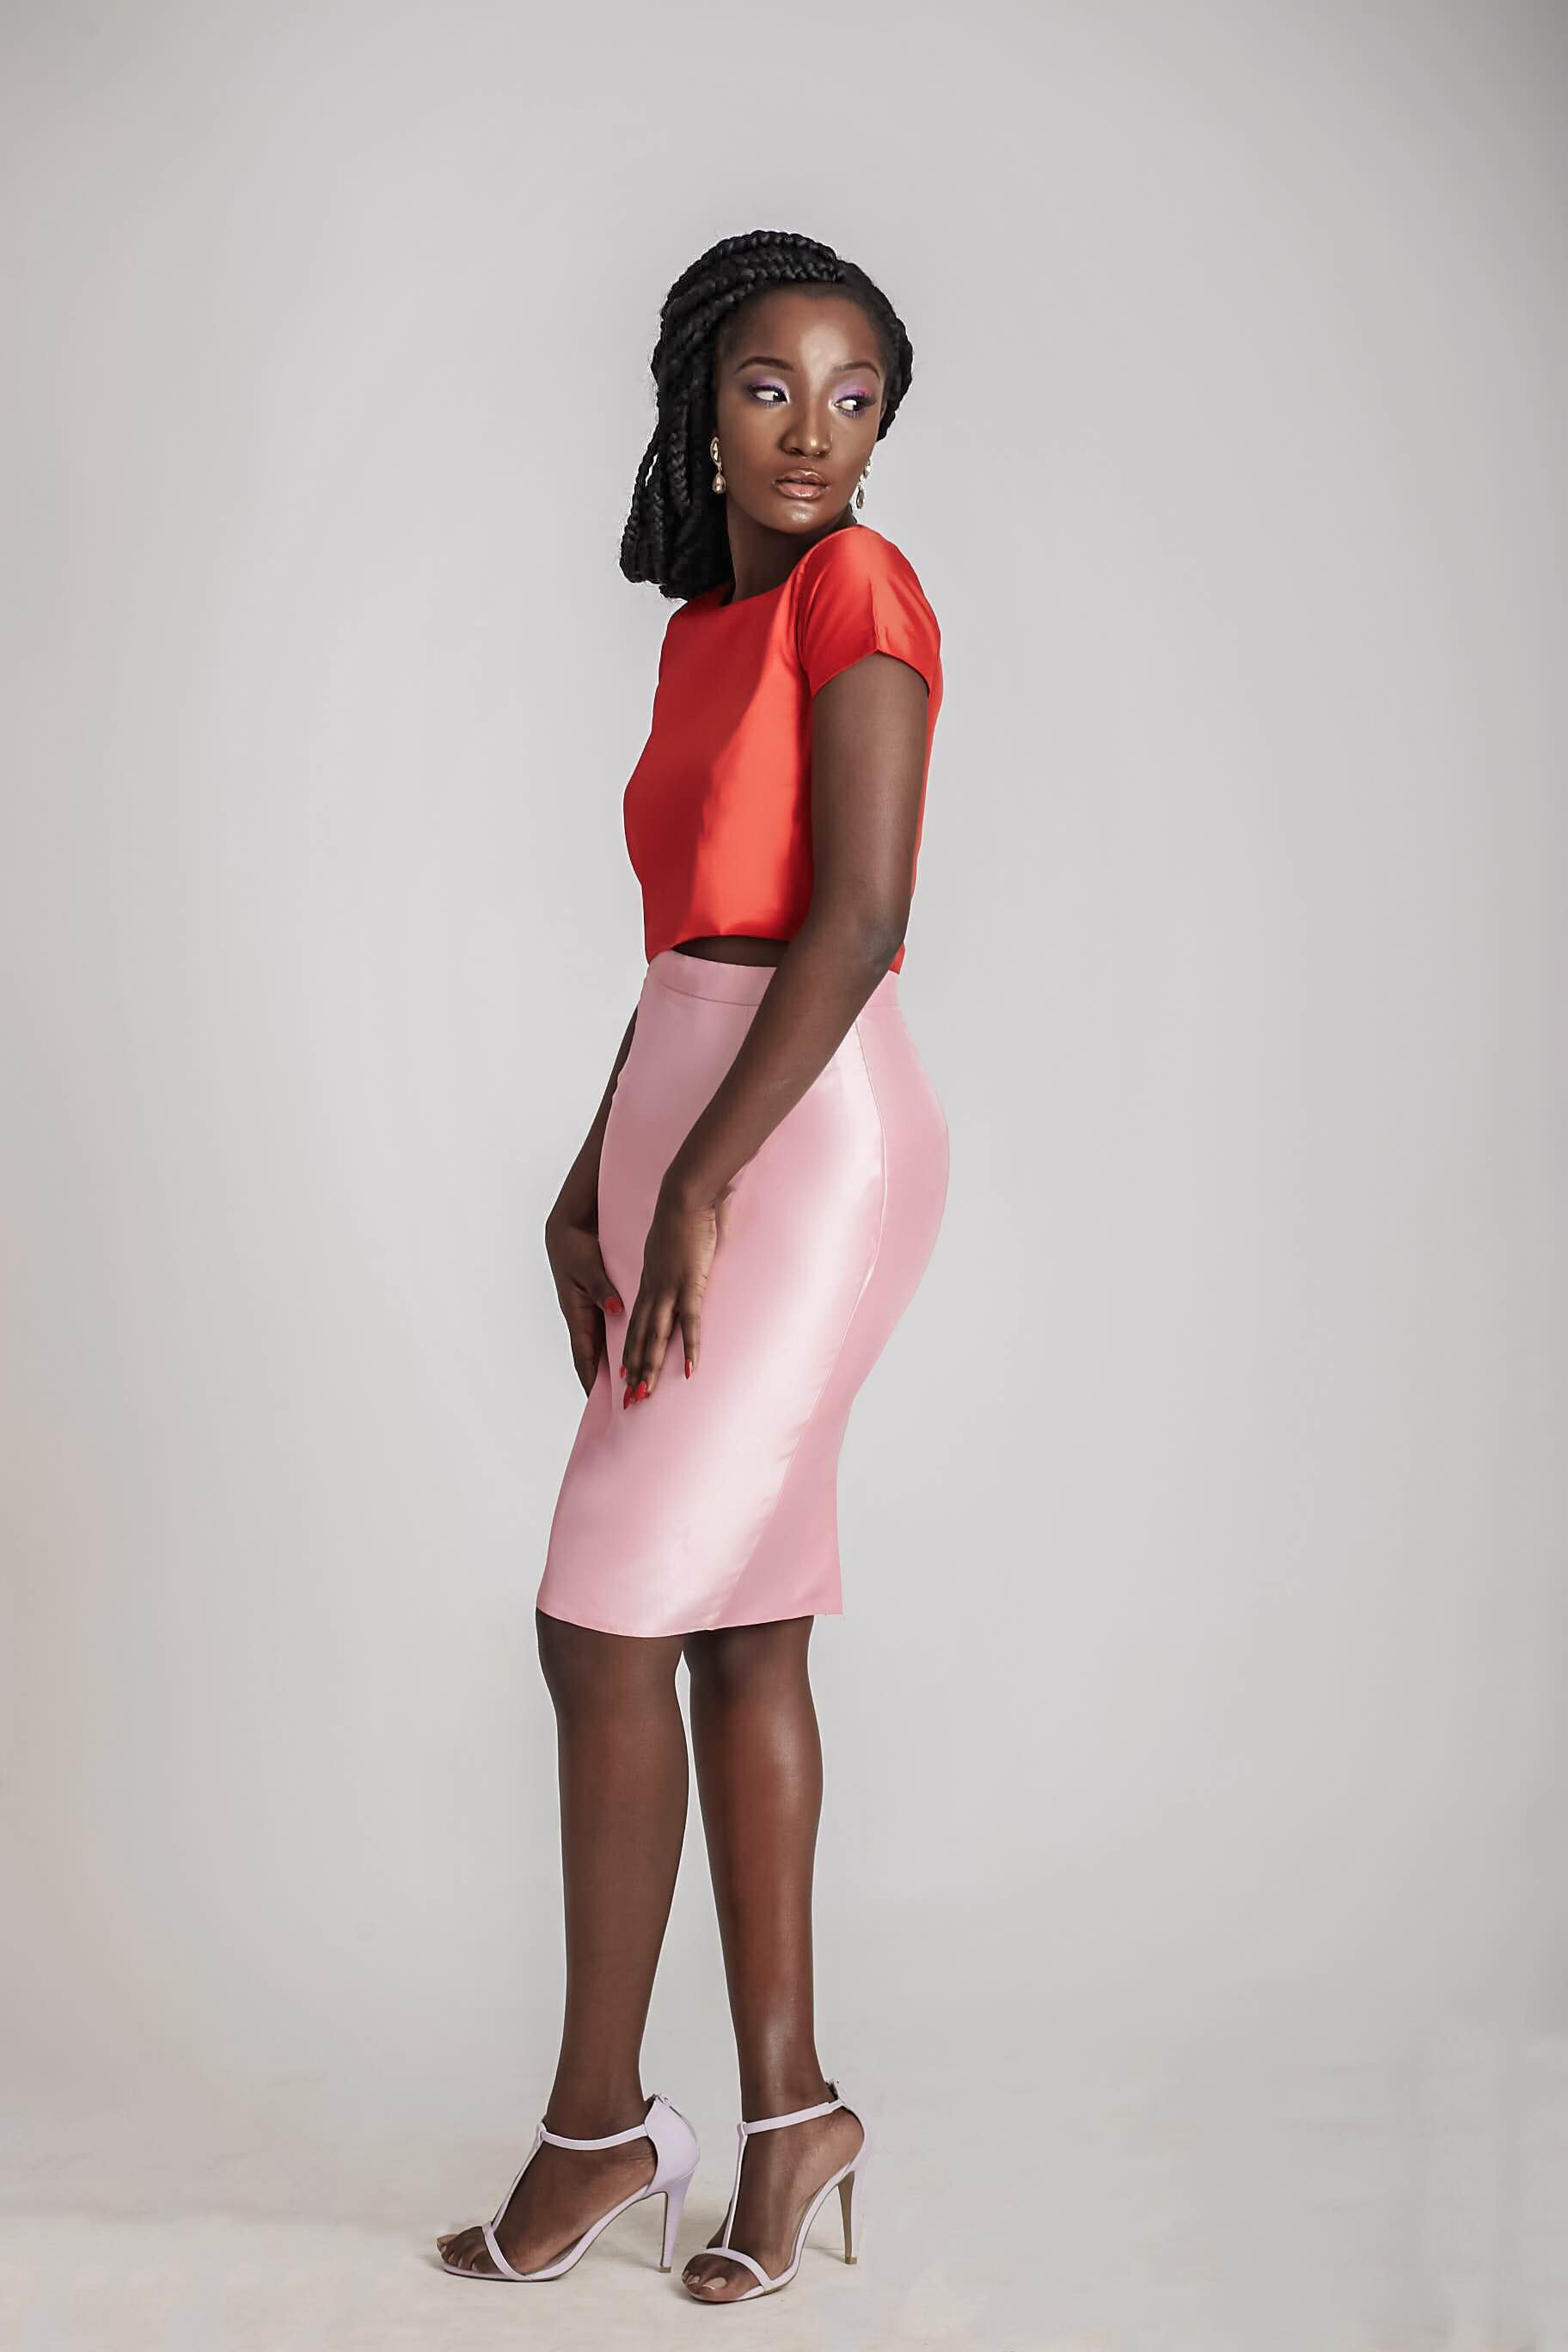 Imad Eduso - BN Style - Collection Lookbook - BellaNaija.com 013